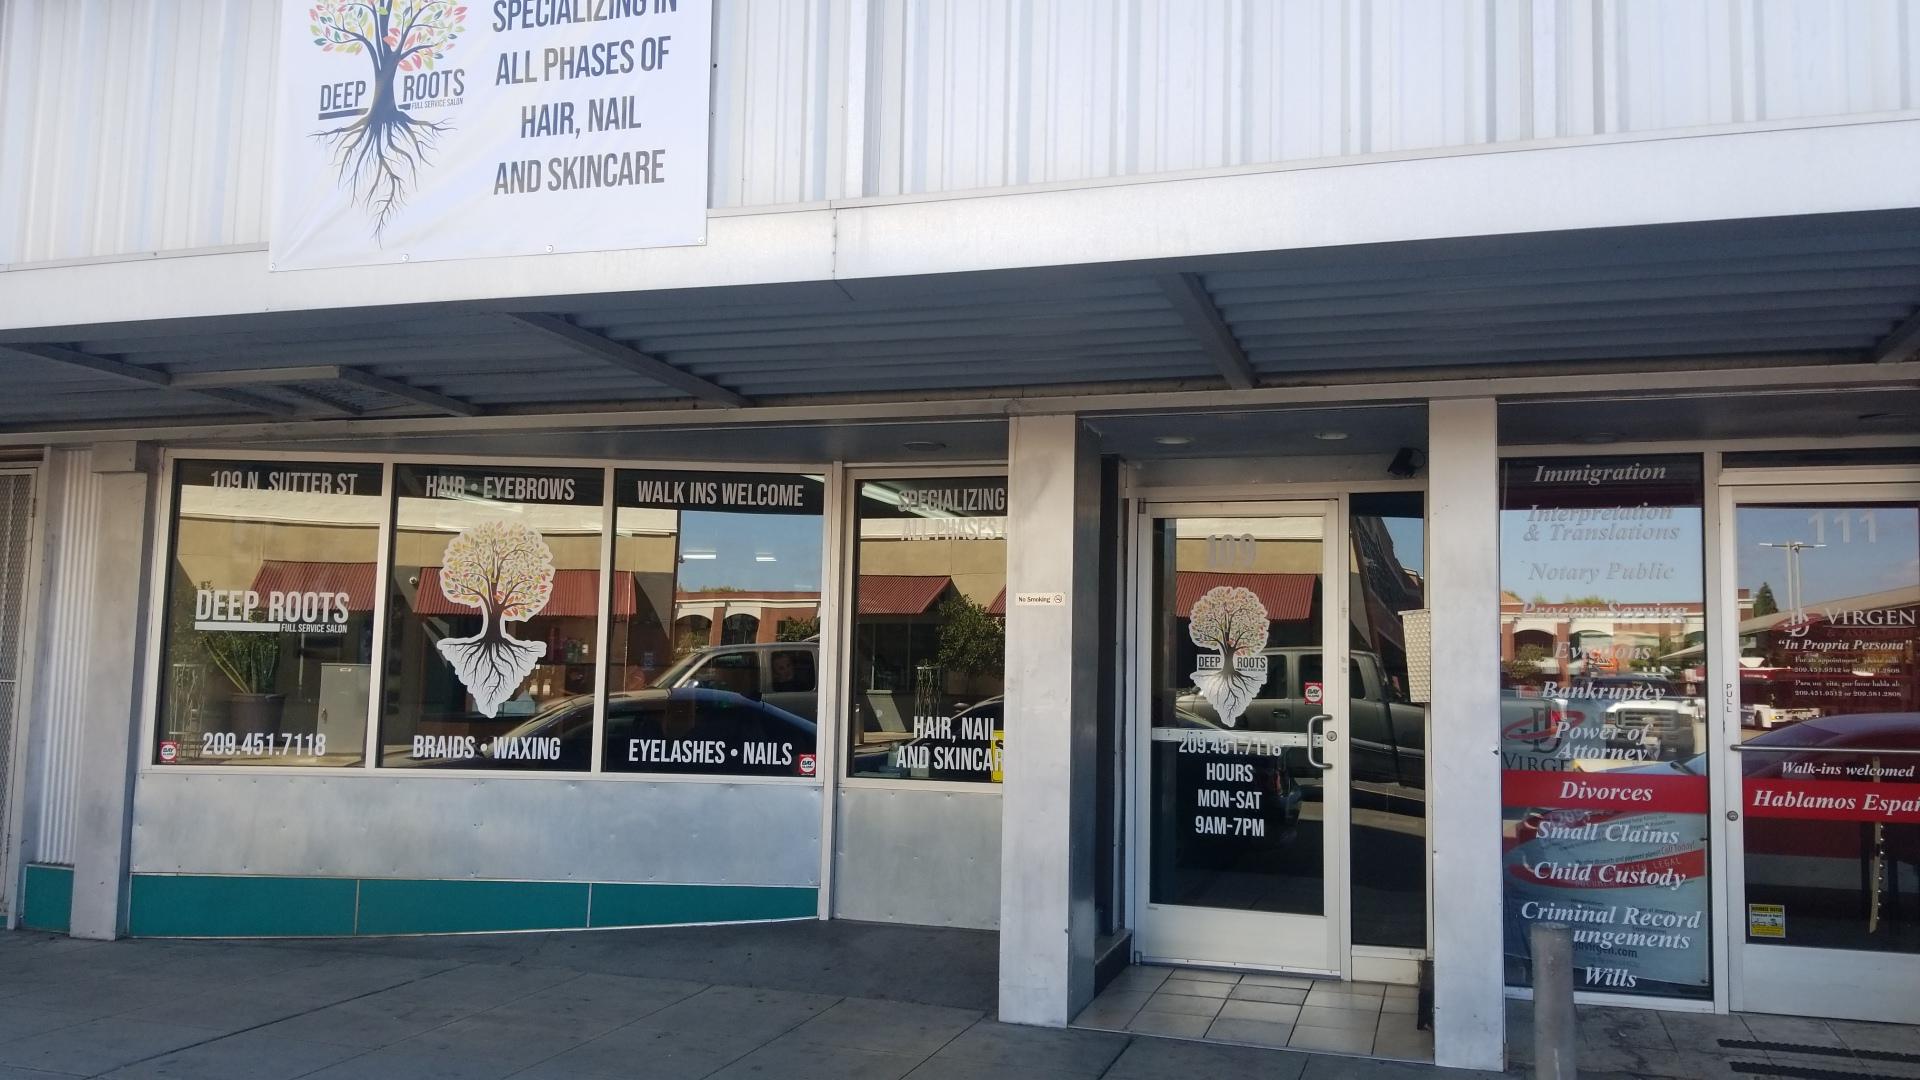 Deep Roots Full Service Salon 109 N Sutter St, Stockton